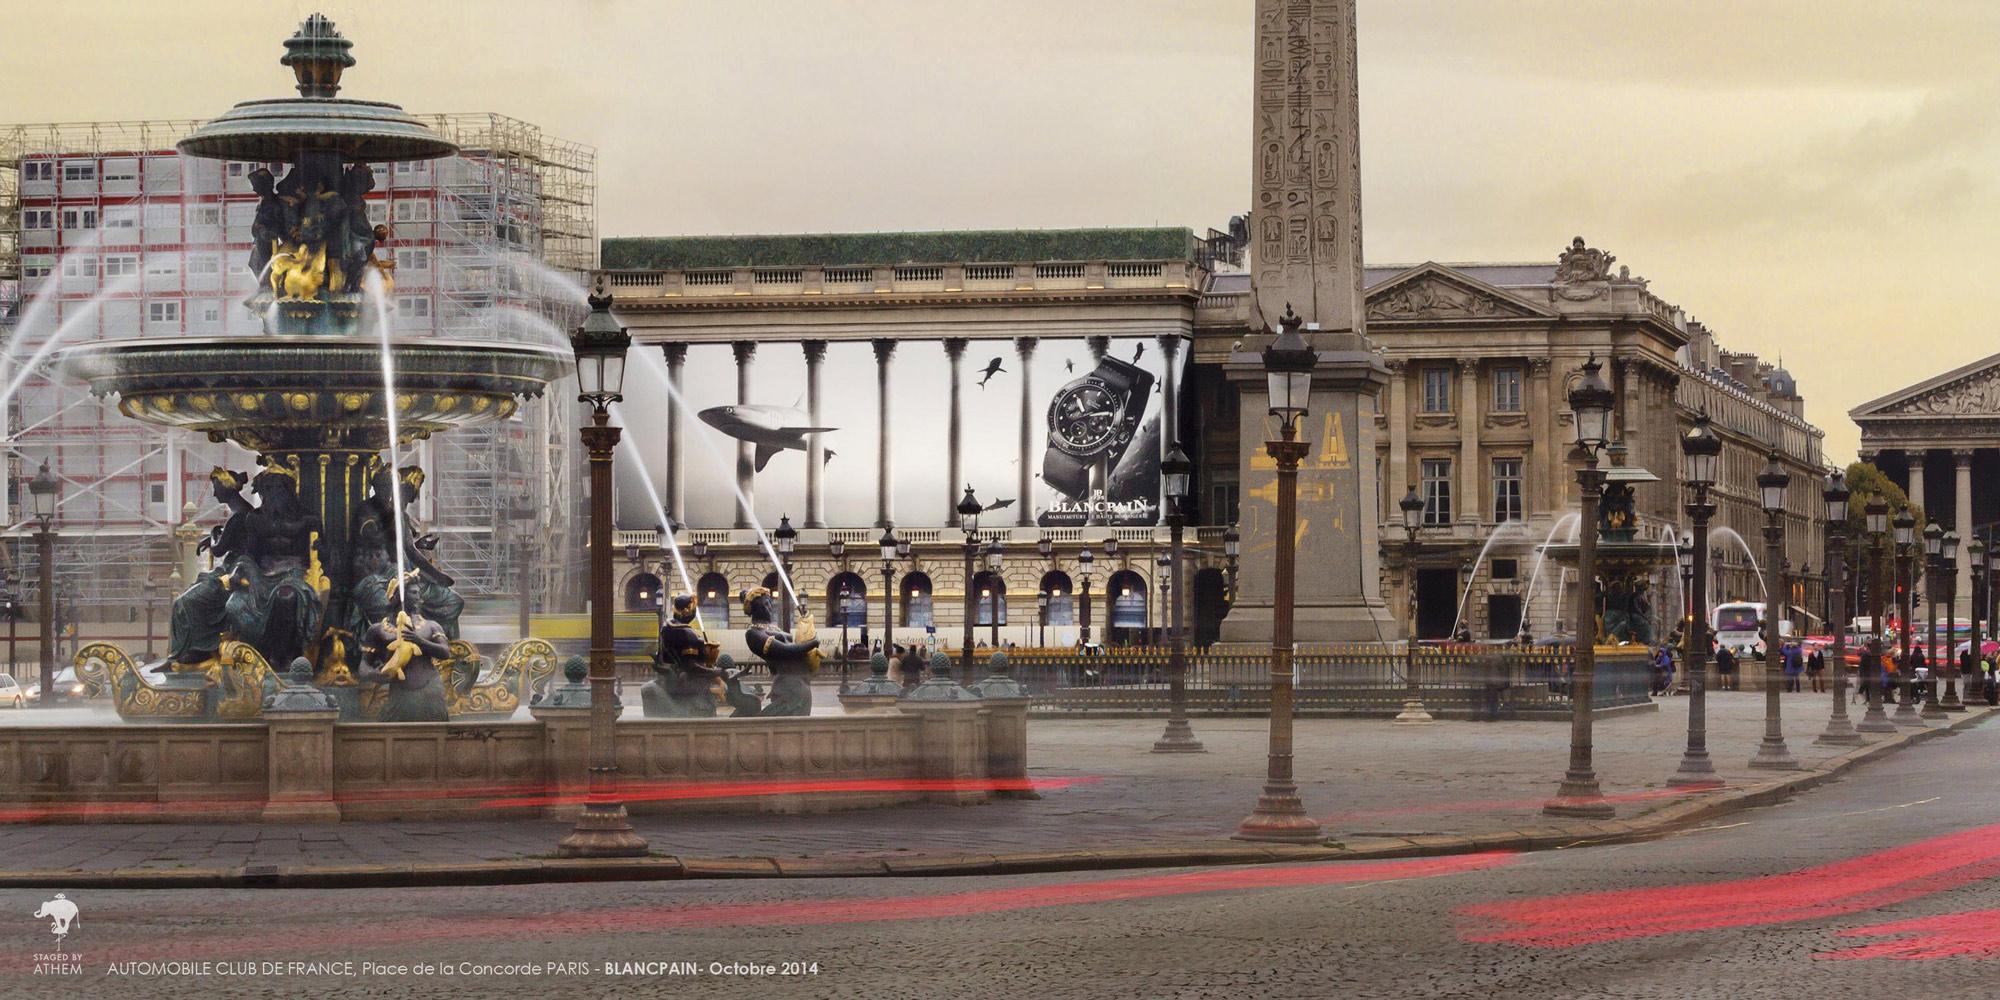 Affichage monumental Blancpain (c)